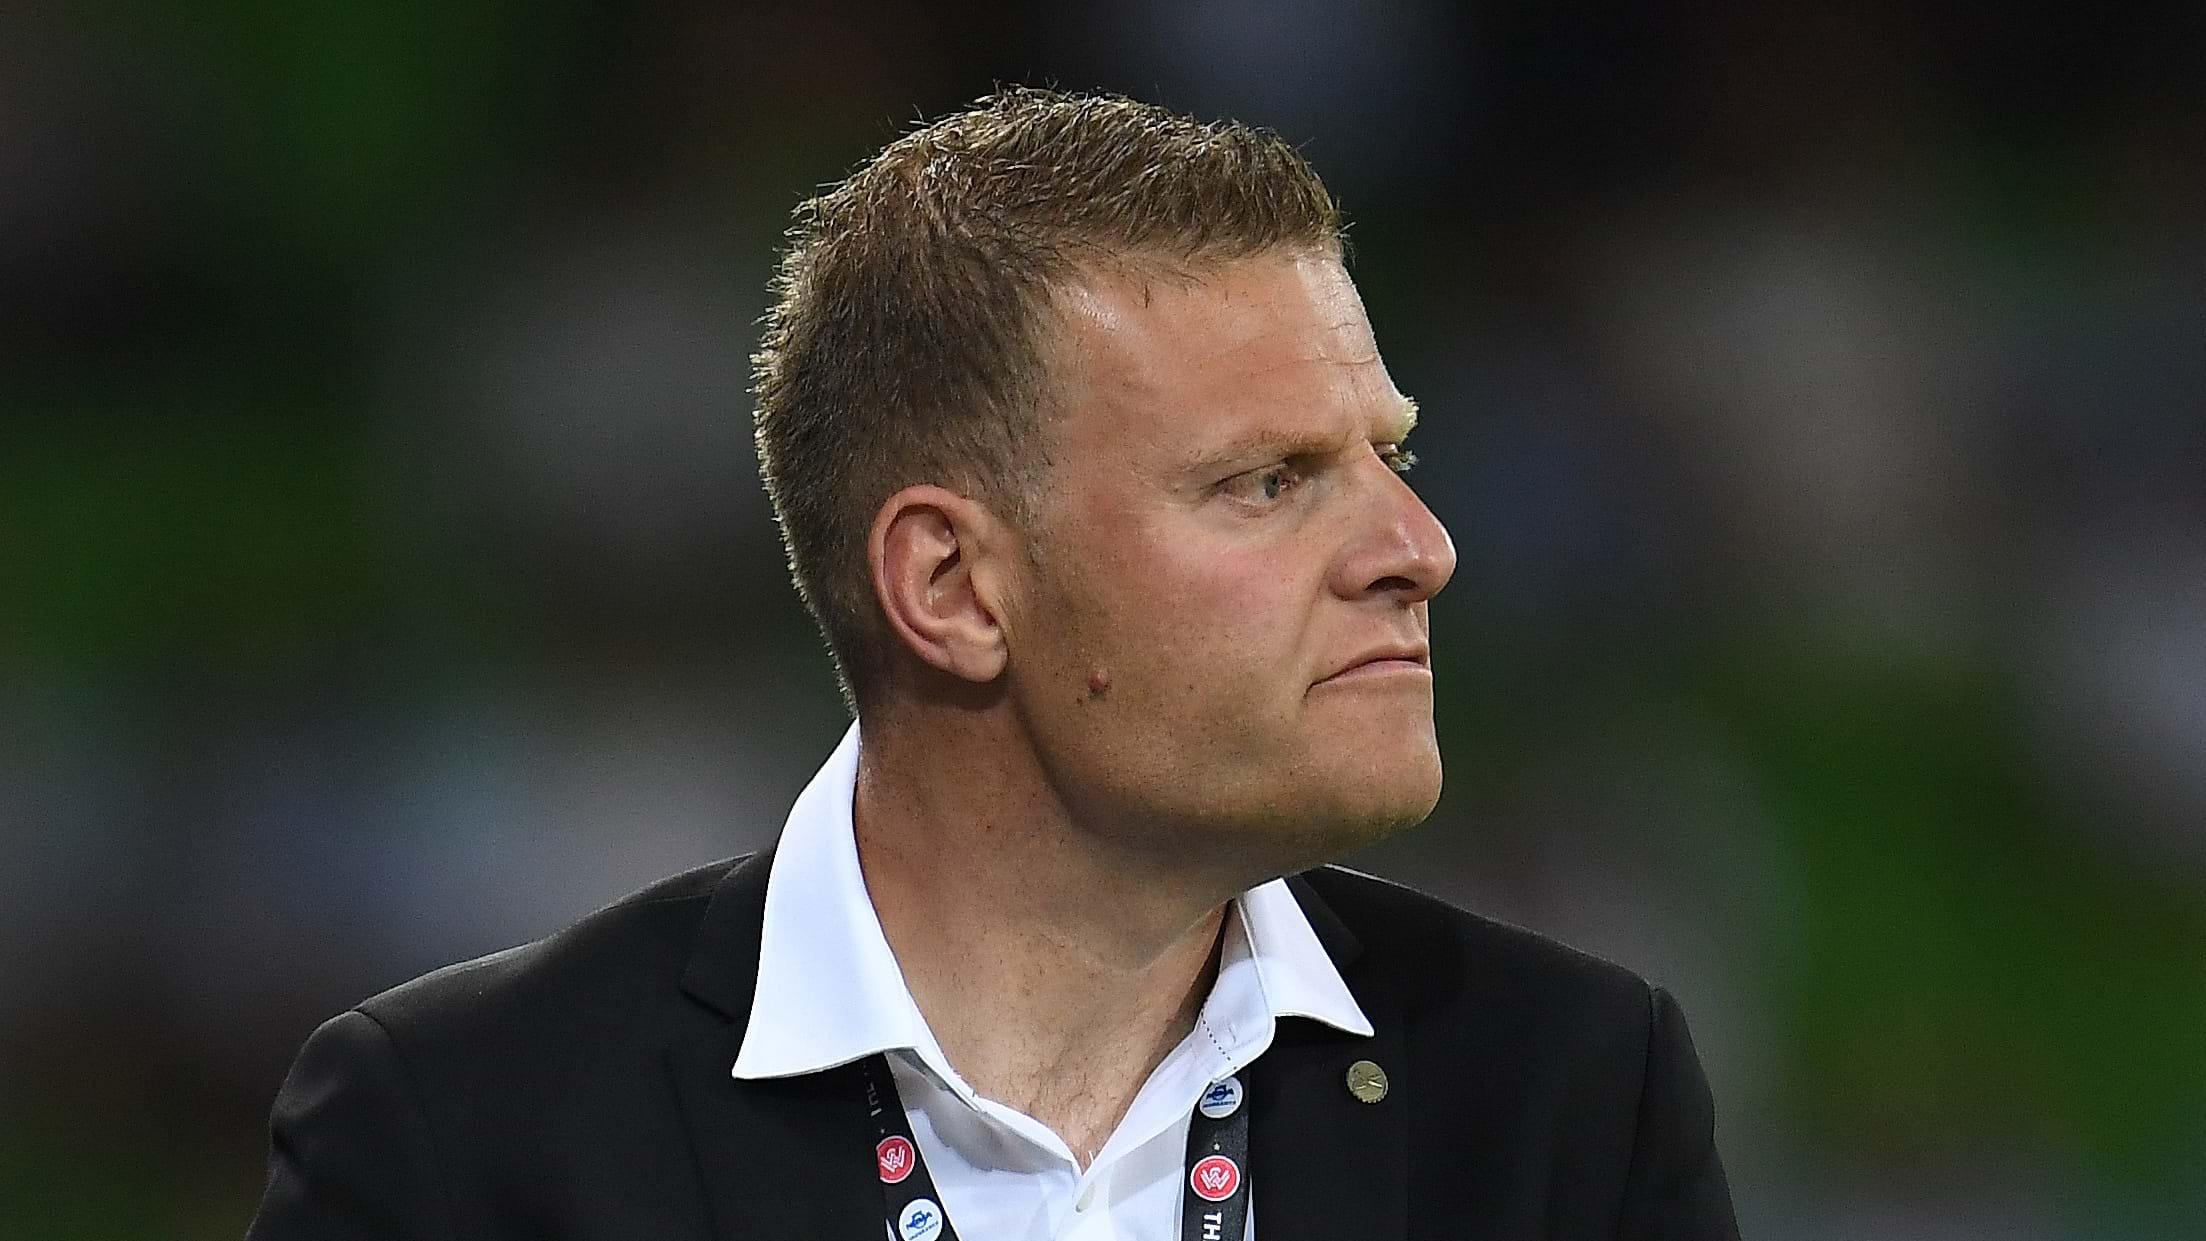 Wanderers sack coach Josep Gombau after missing A-league finals